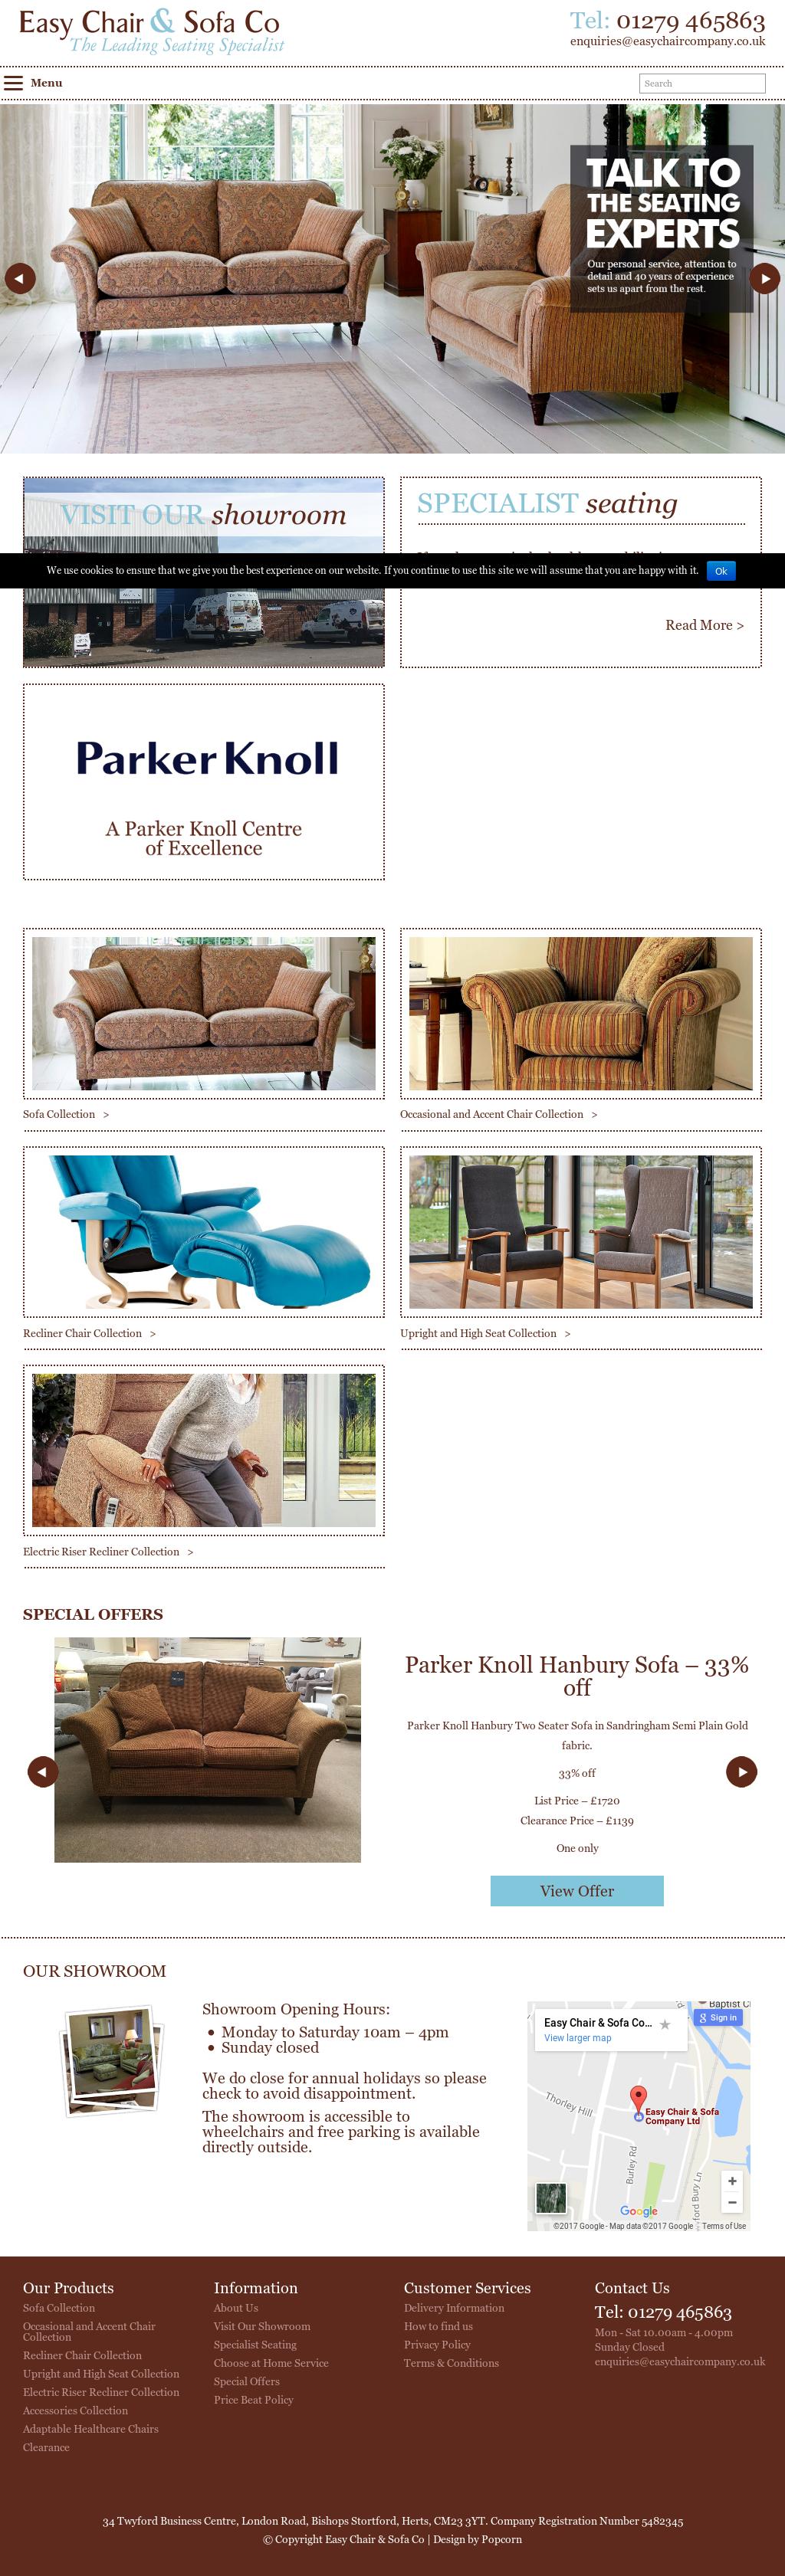 Sensational Easy Chair Sofa Co Competitors Revenue And Employees Inzonedesignstudio Interior Chair Design Inzonedesignstudiocom